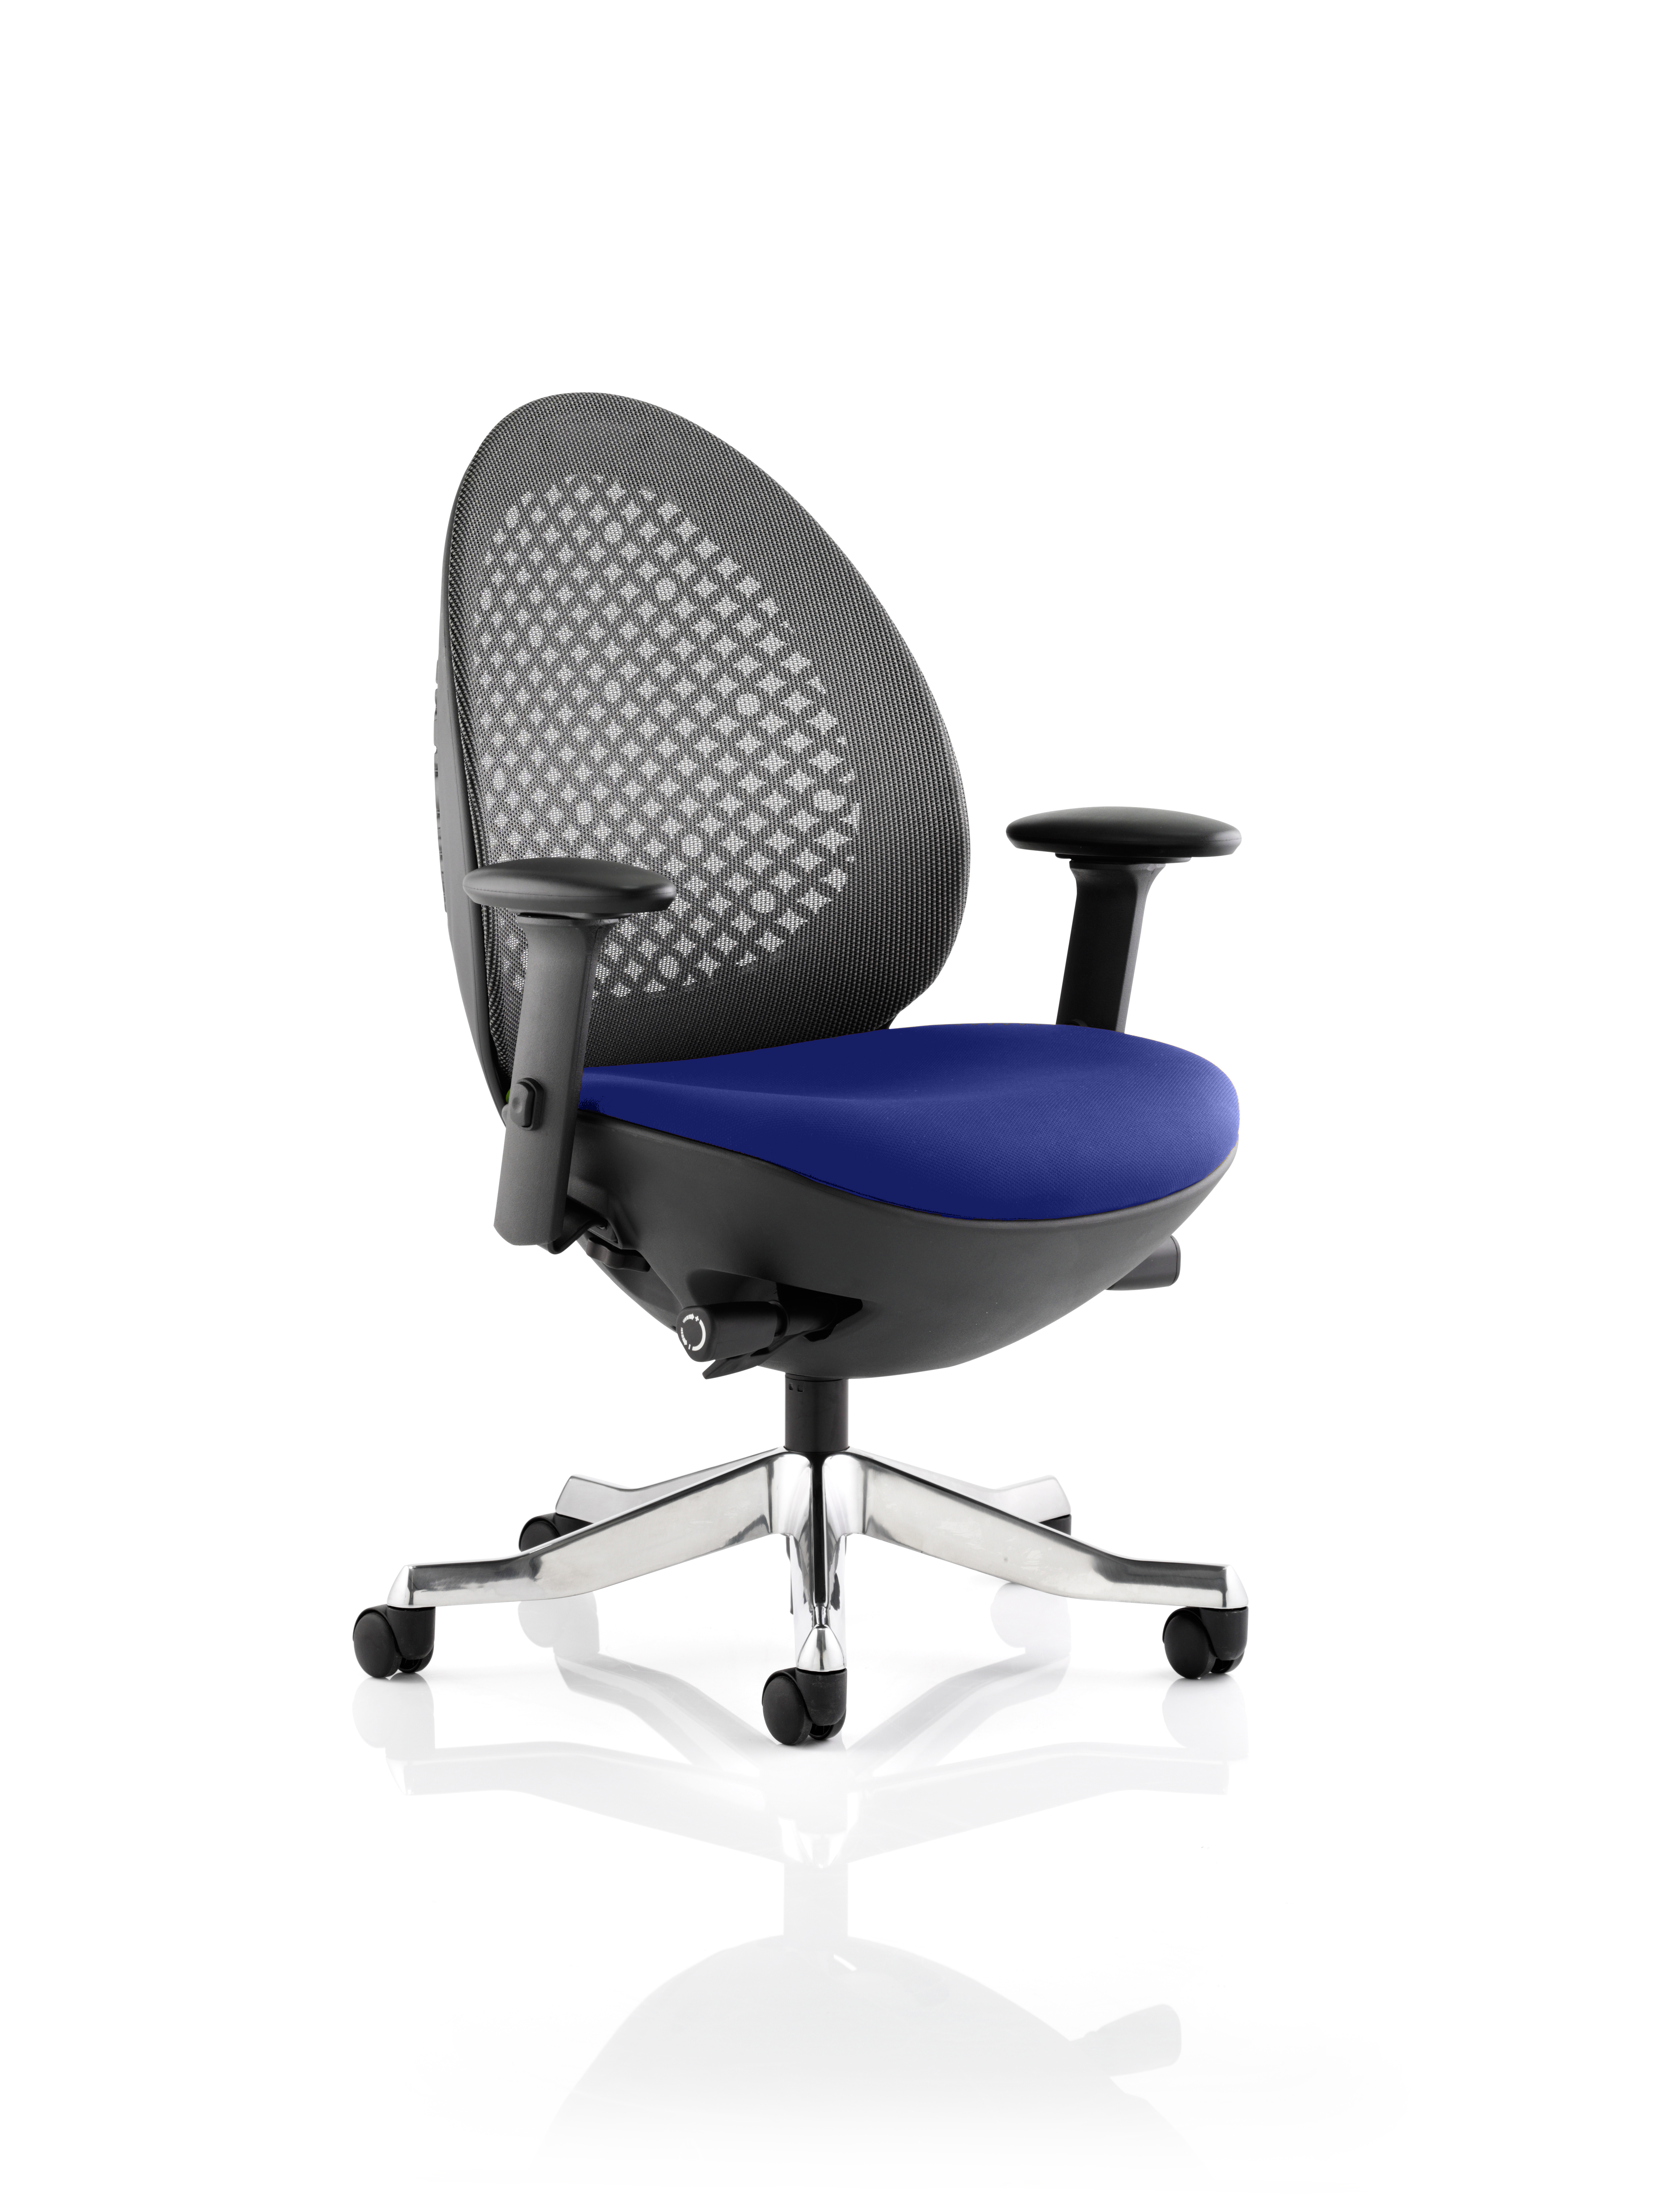 Revo Bespoke Colour Seat In Stevia Blue